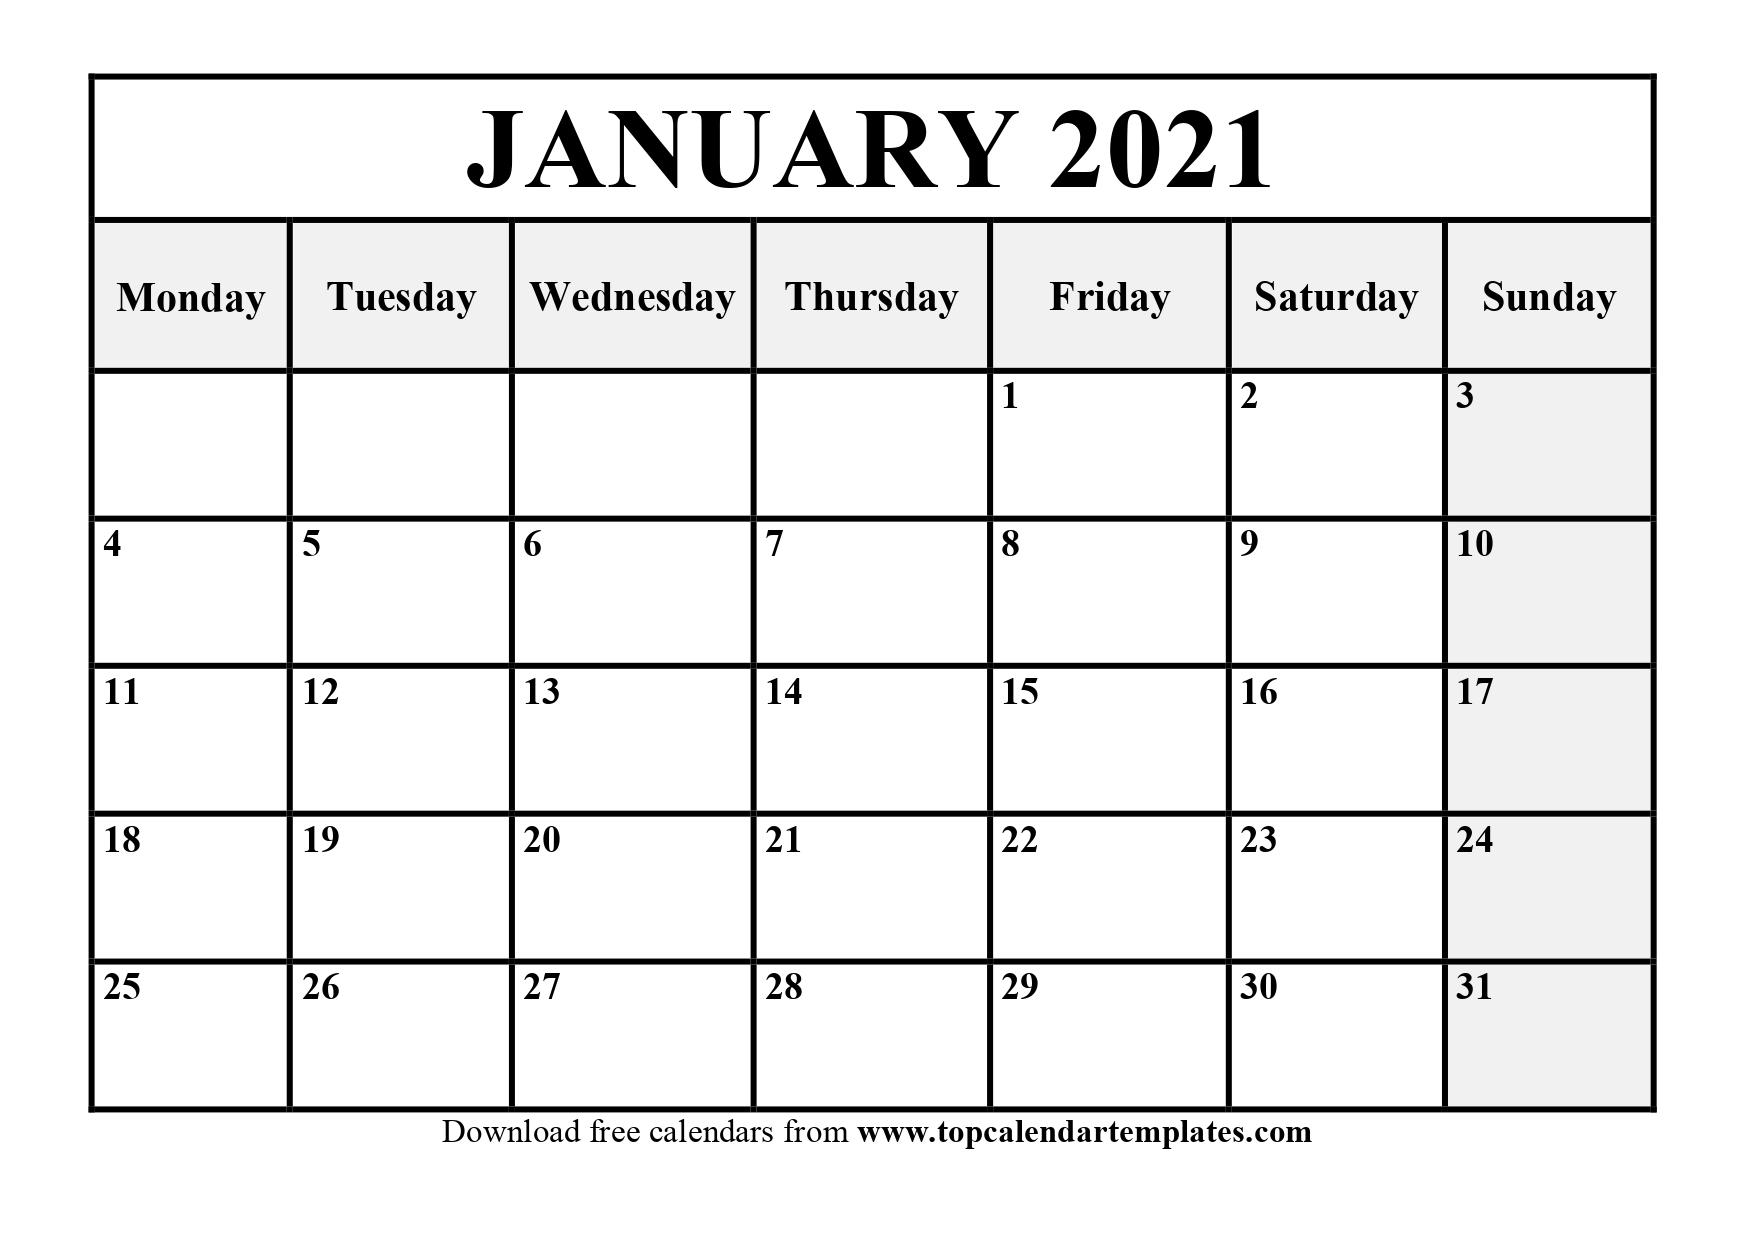 Free January 2021 Calendar Printable Pdf Word 2